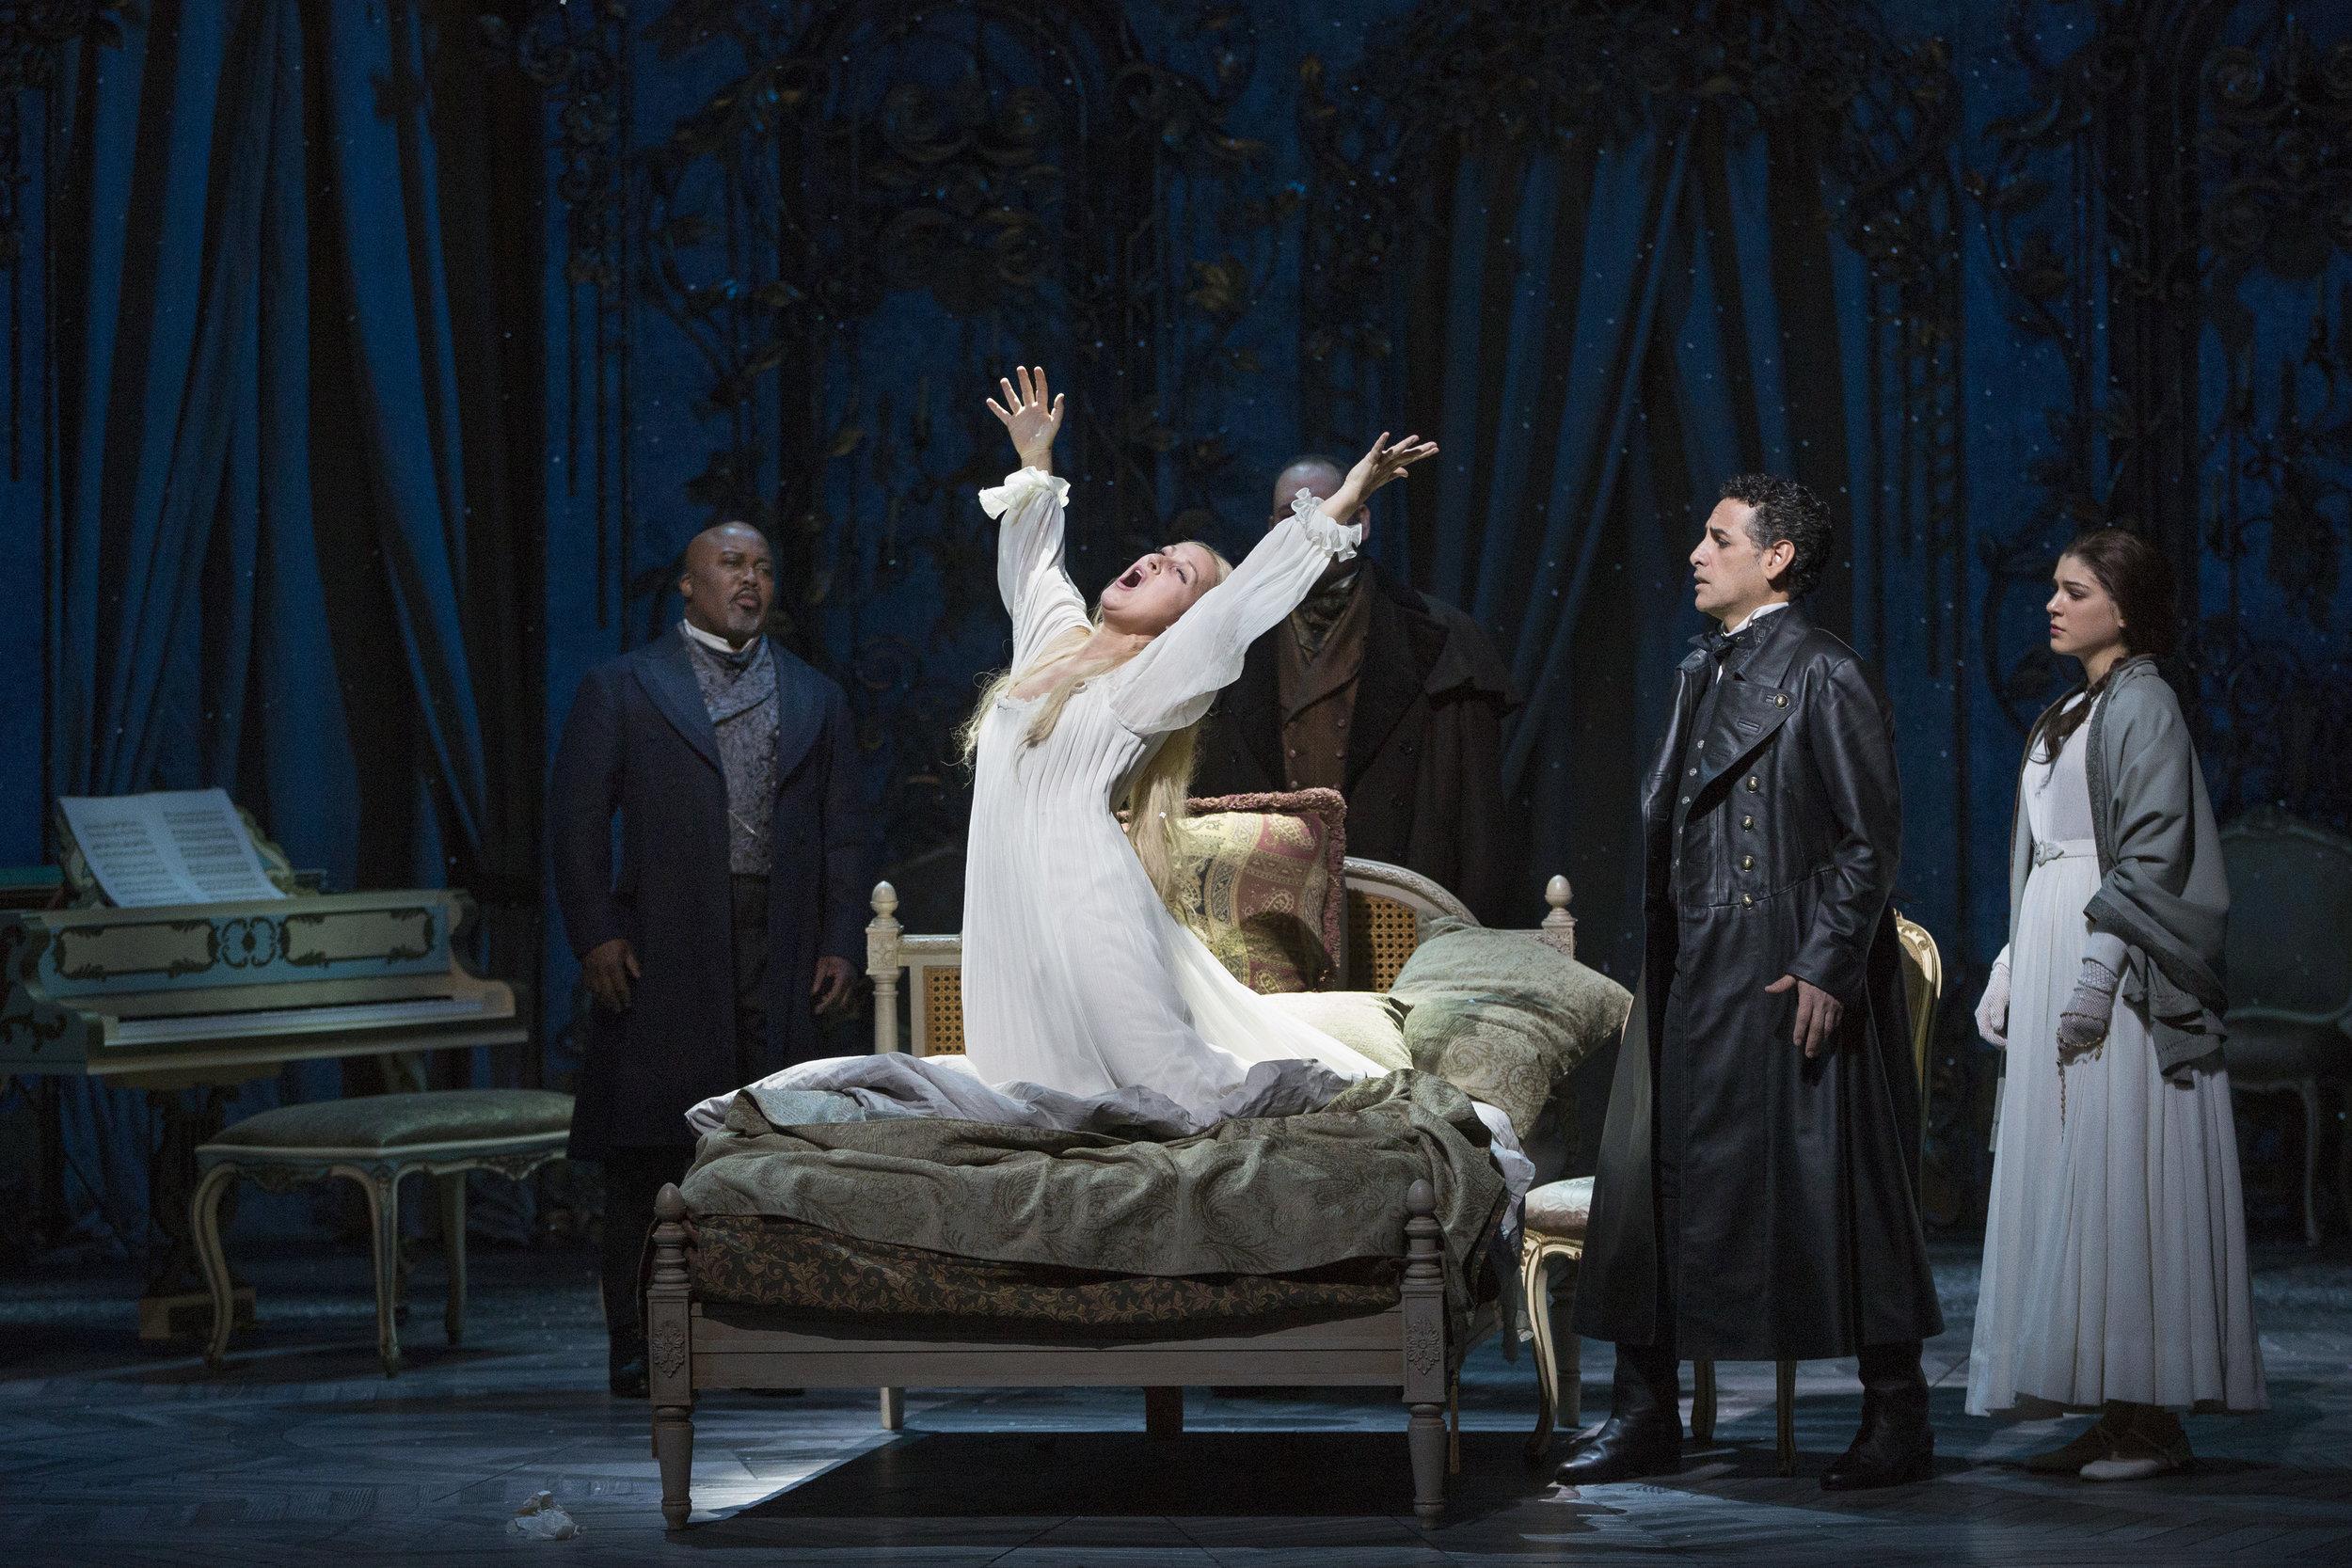 La Traviata - Photo: Marty Sohl/ Met Opera